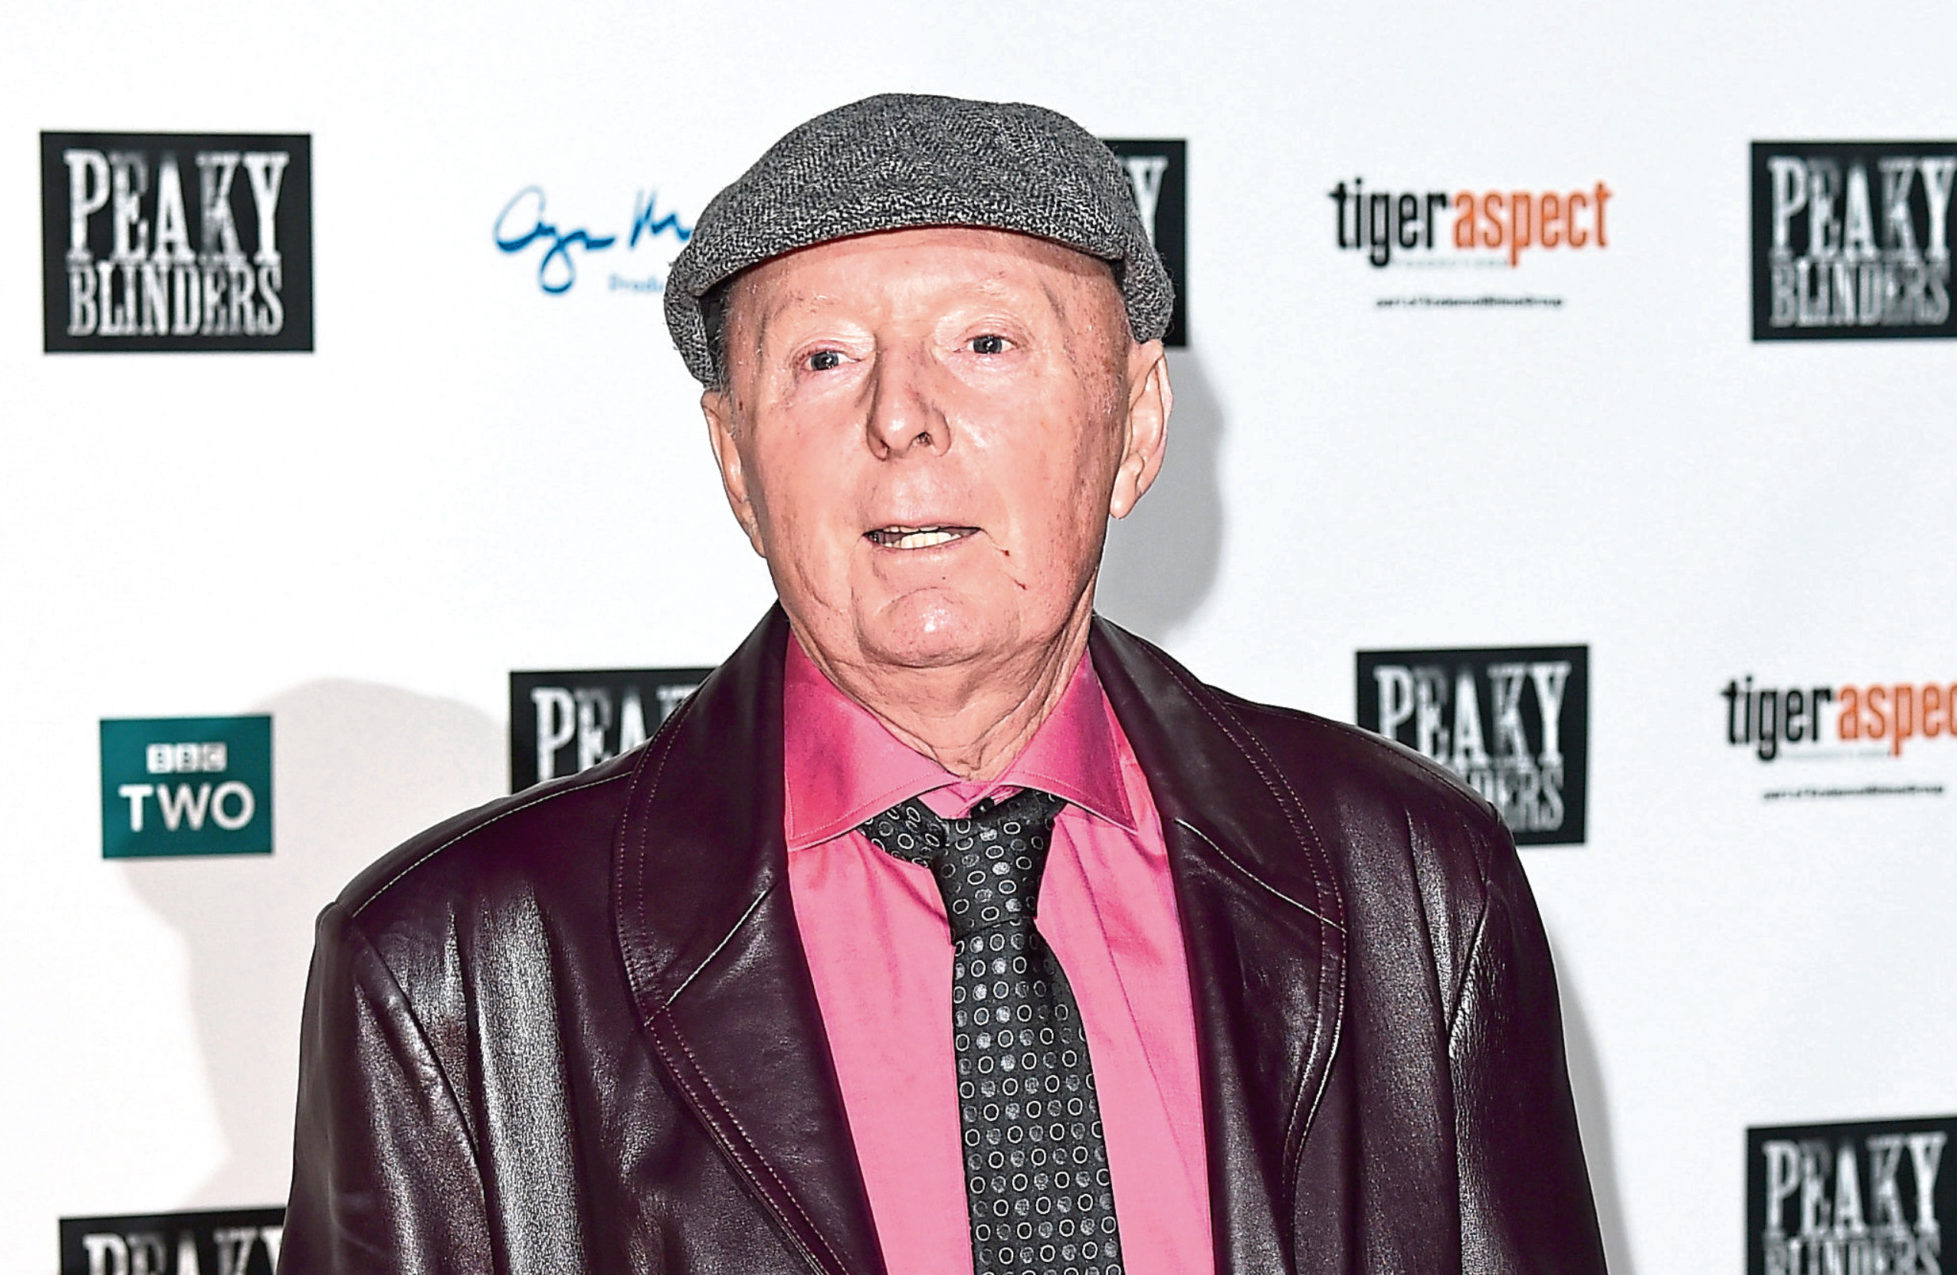 Jasper Carrot attends a Peaky Blinders premiere